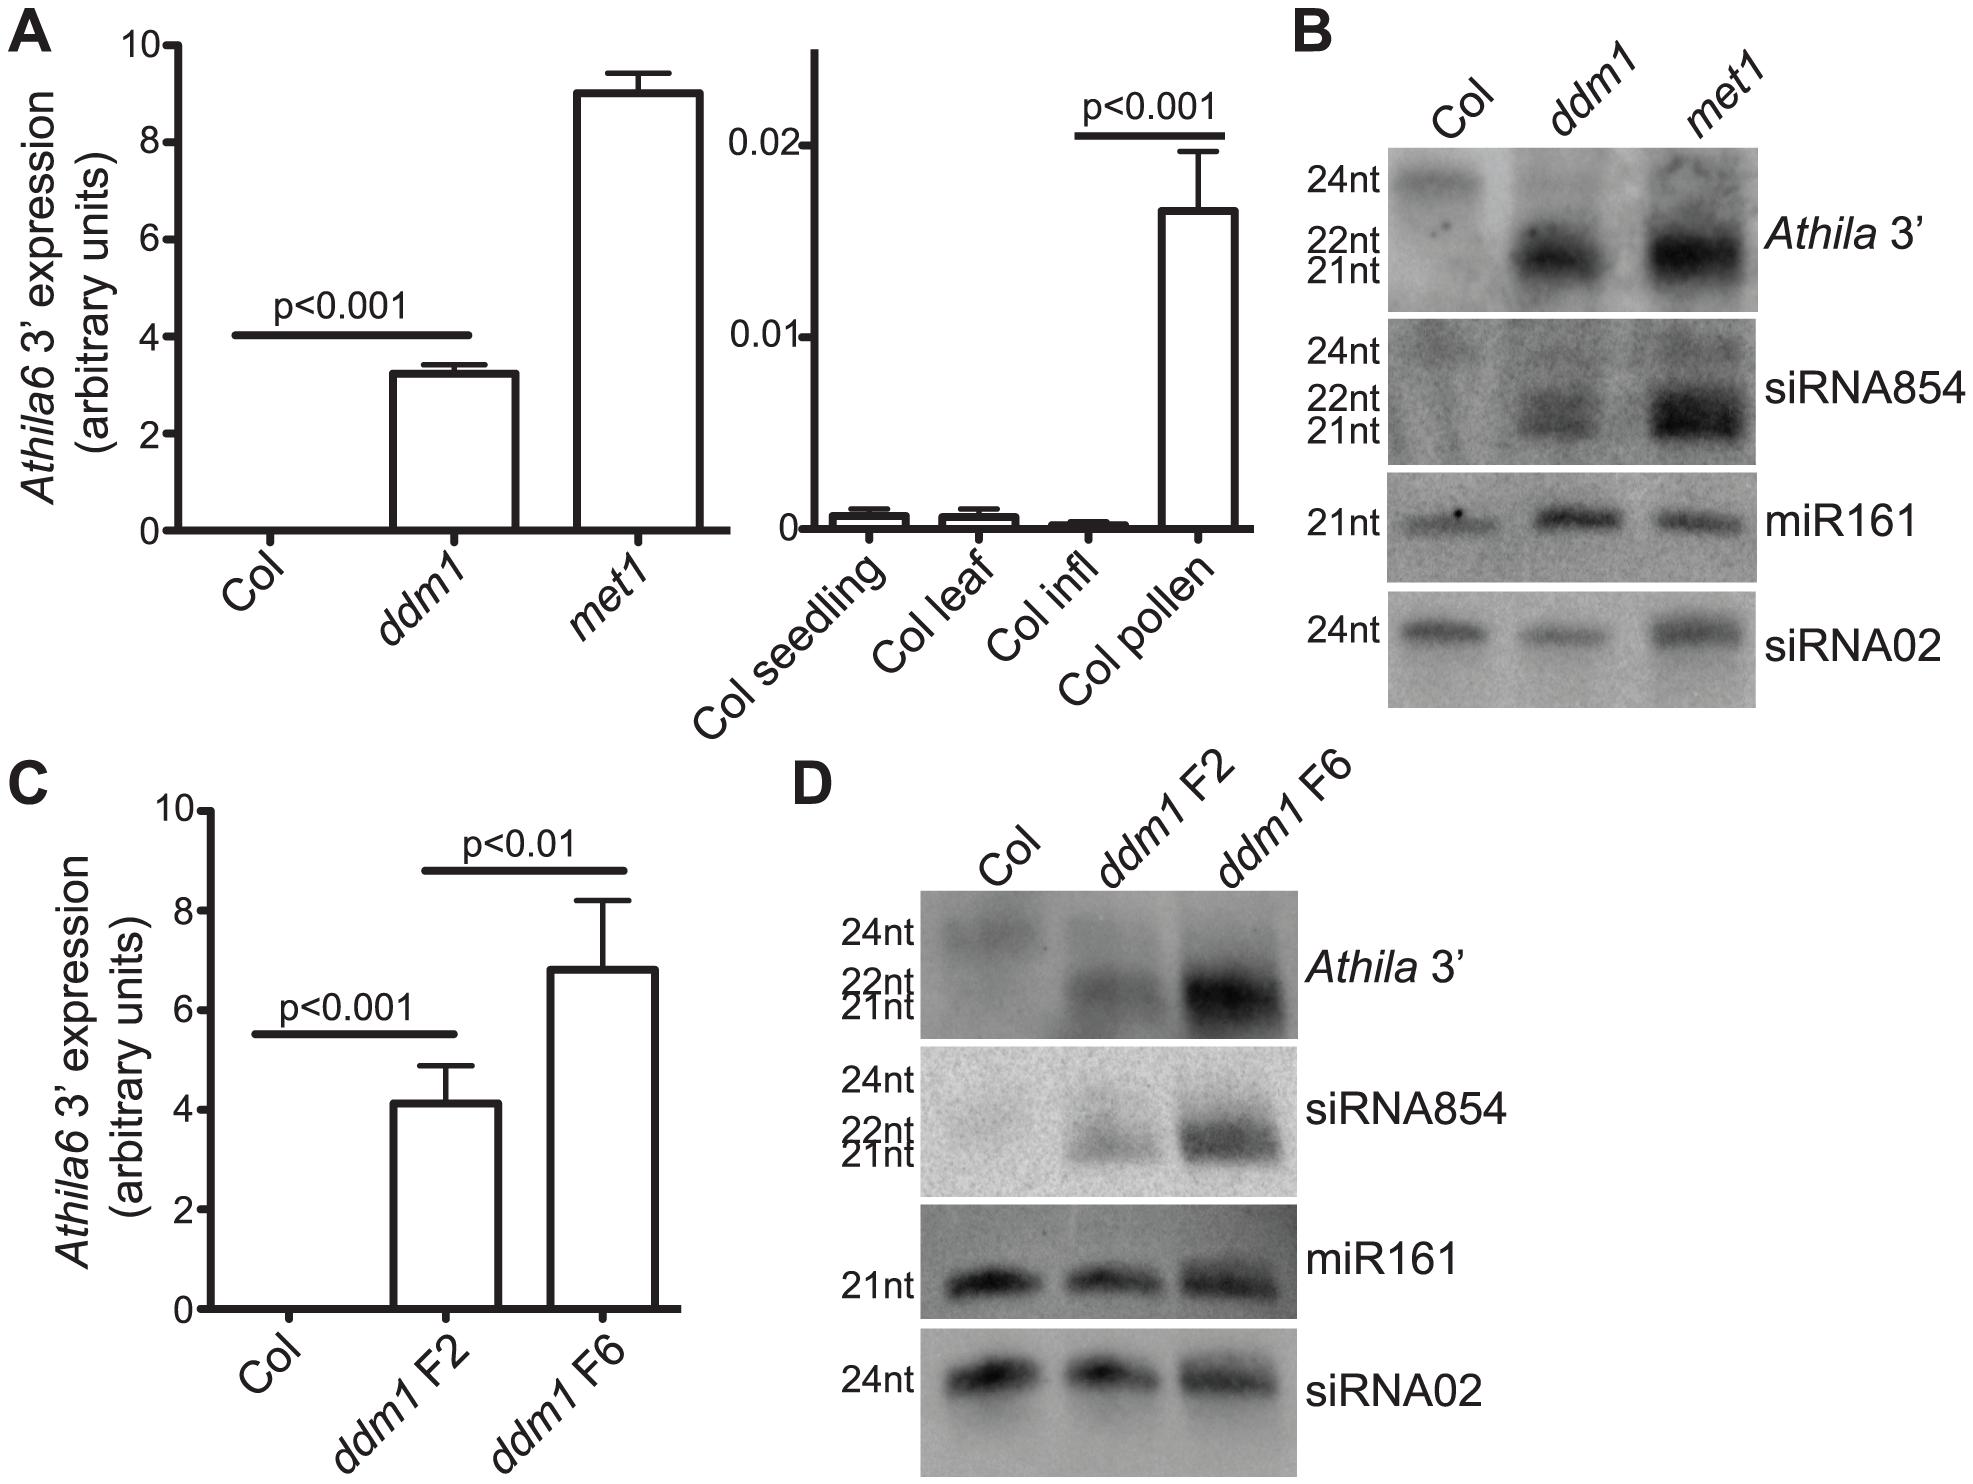 Expression of the <i>Athila6</i> retrotransposon leads to accumulation of <i>Athila</i> 21–22 nt siRNAs, including siRNA854.